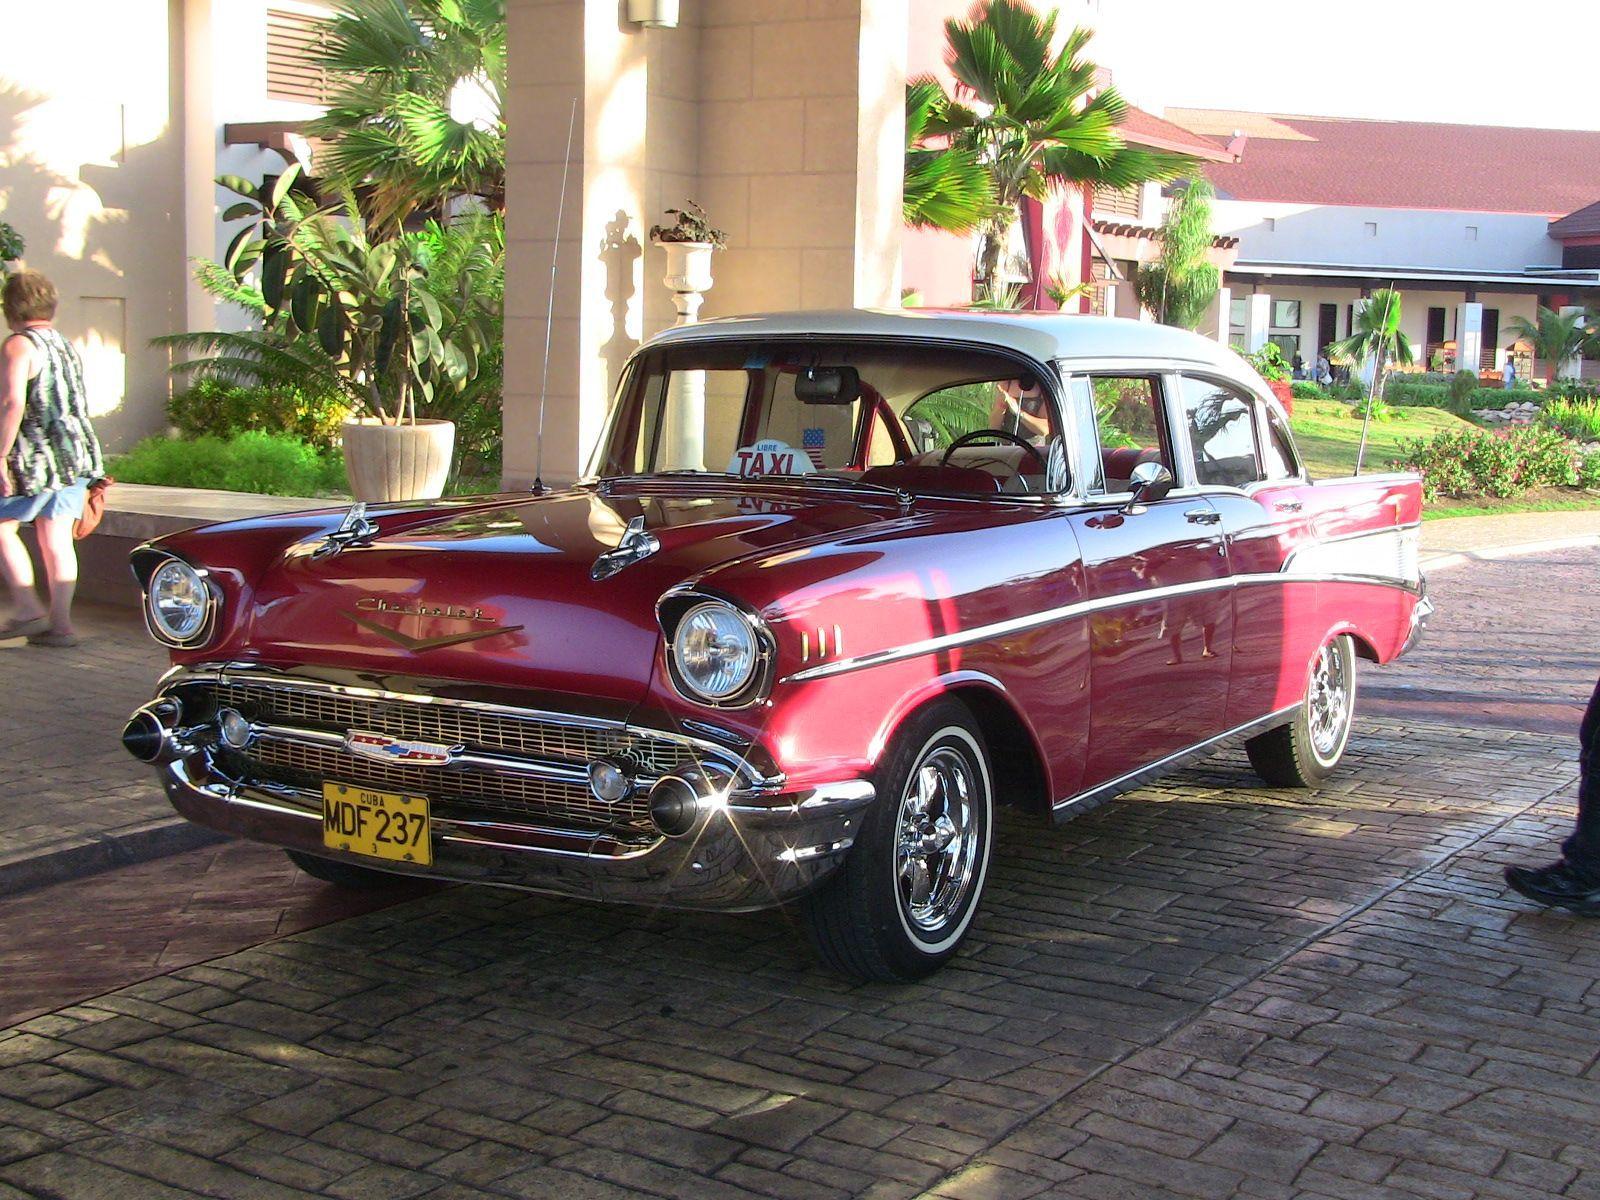 Cuba vehicles